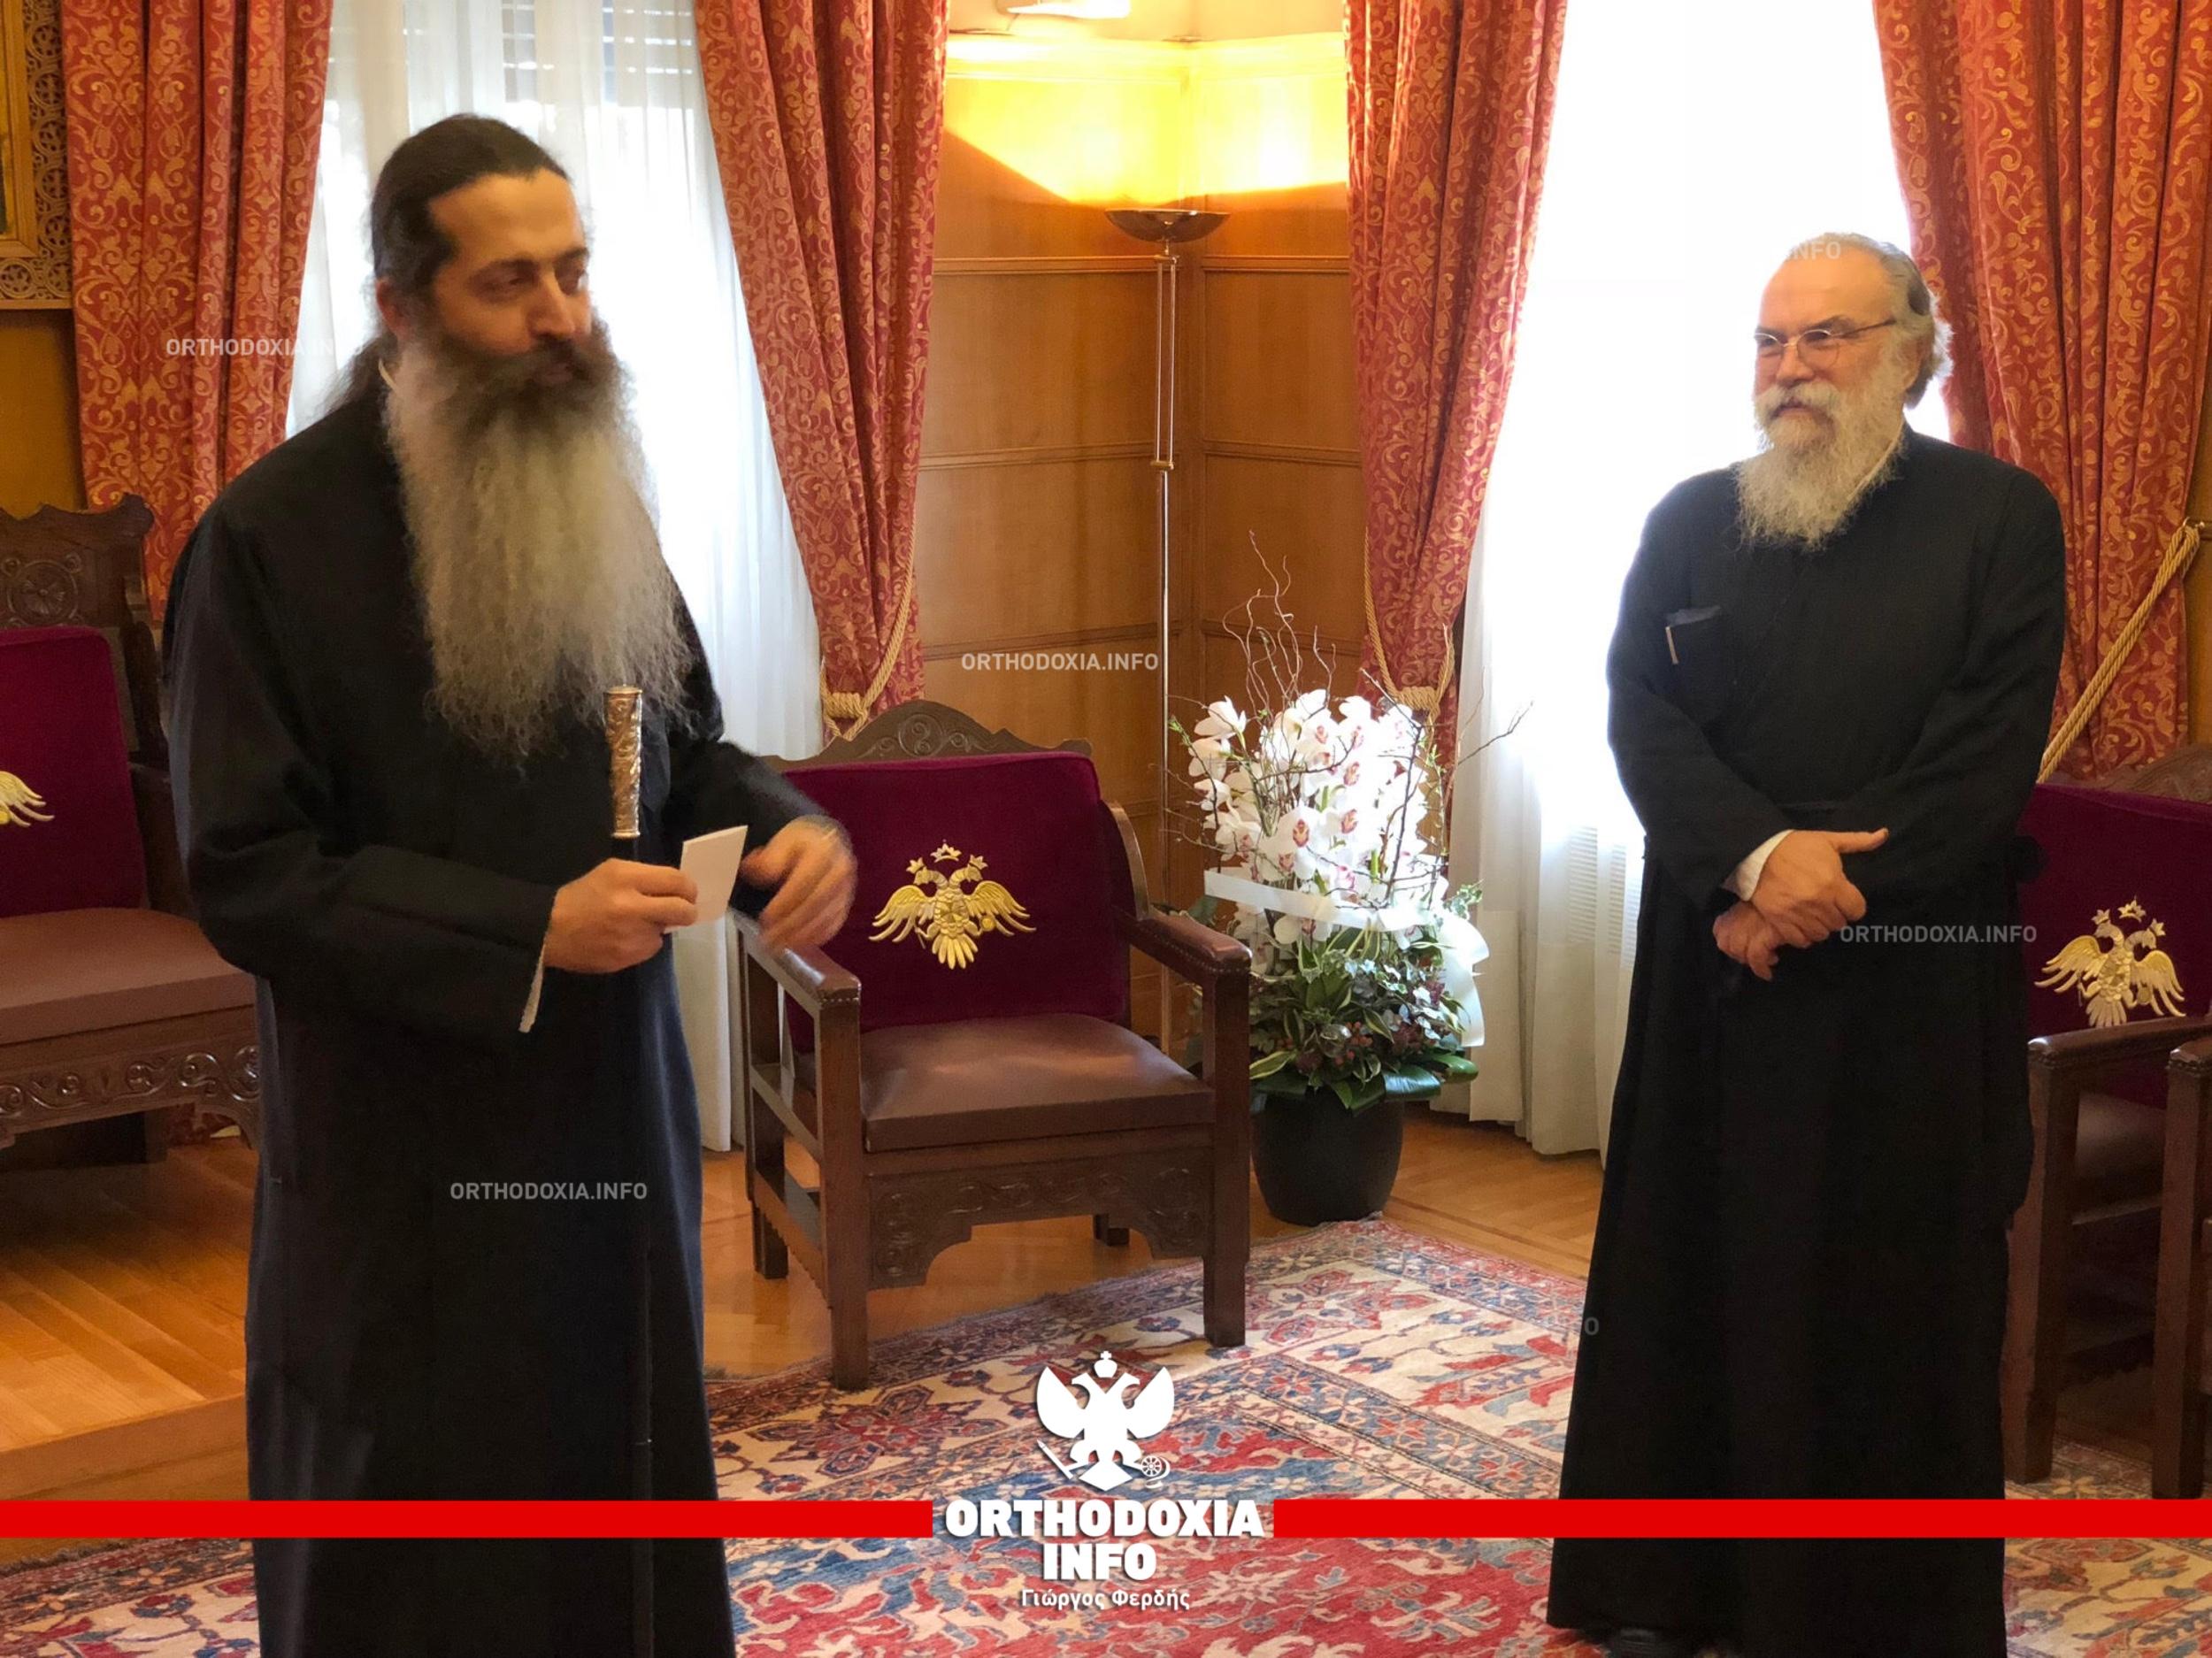 PHOTO: Γ. Φερδής/Orthodoxia.info